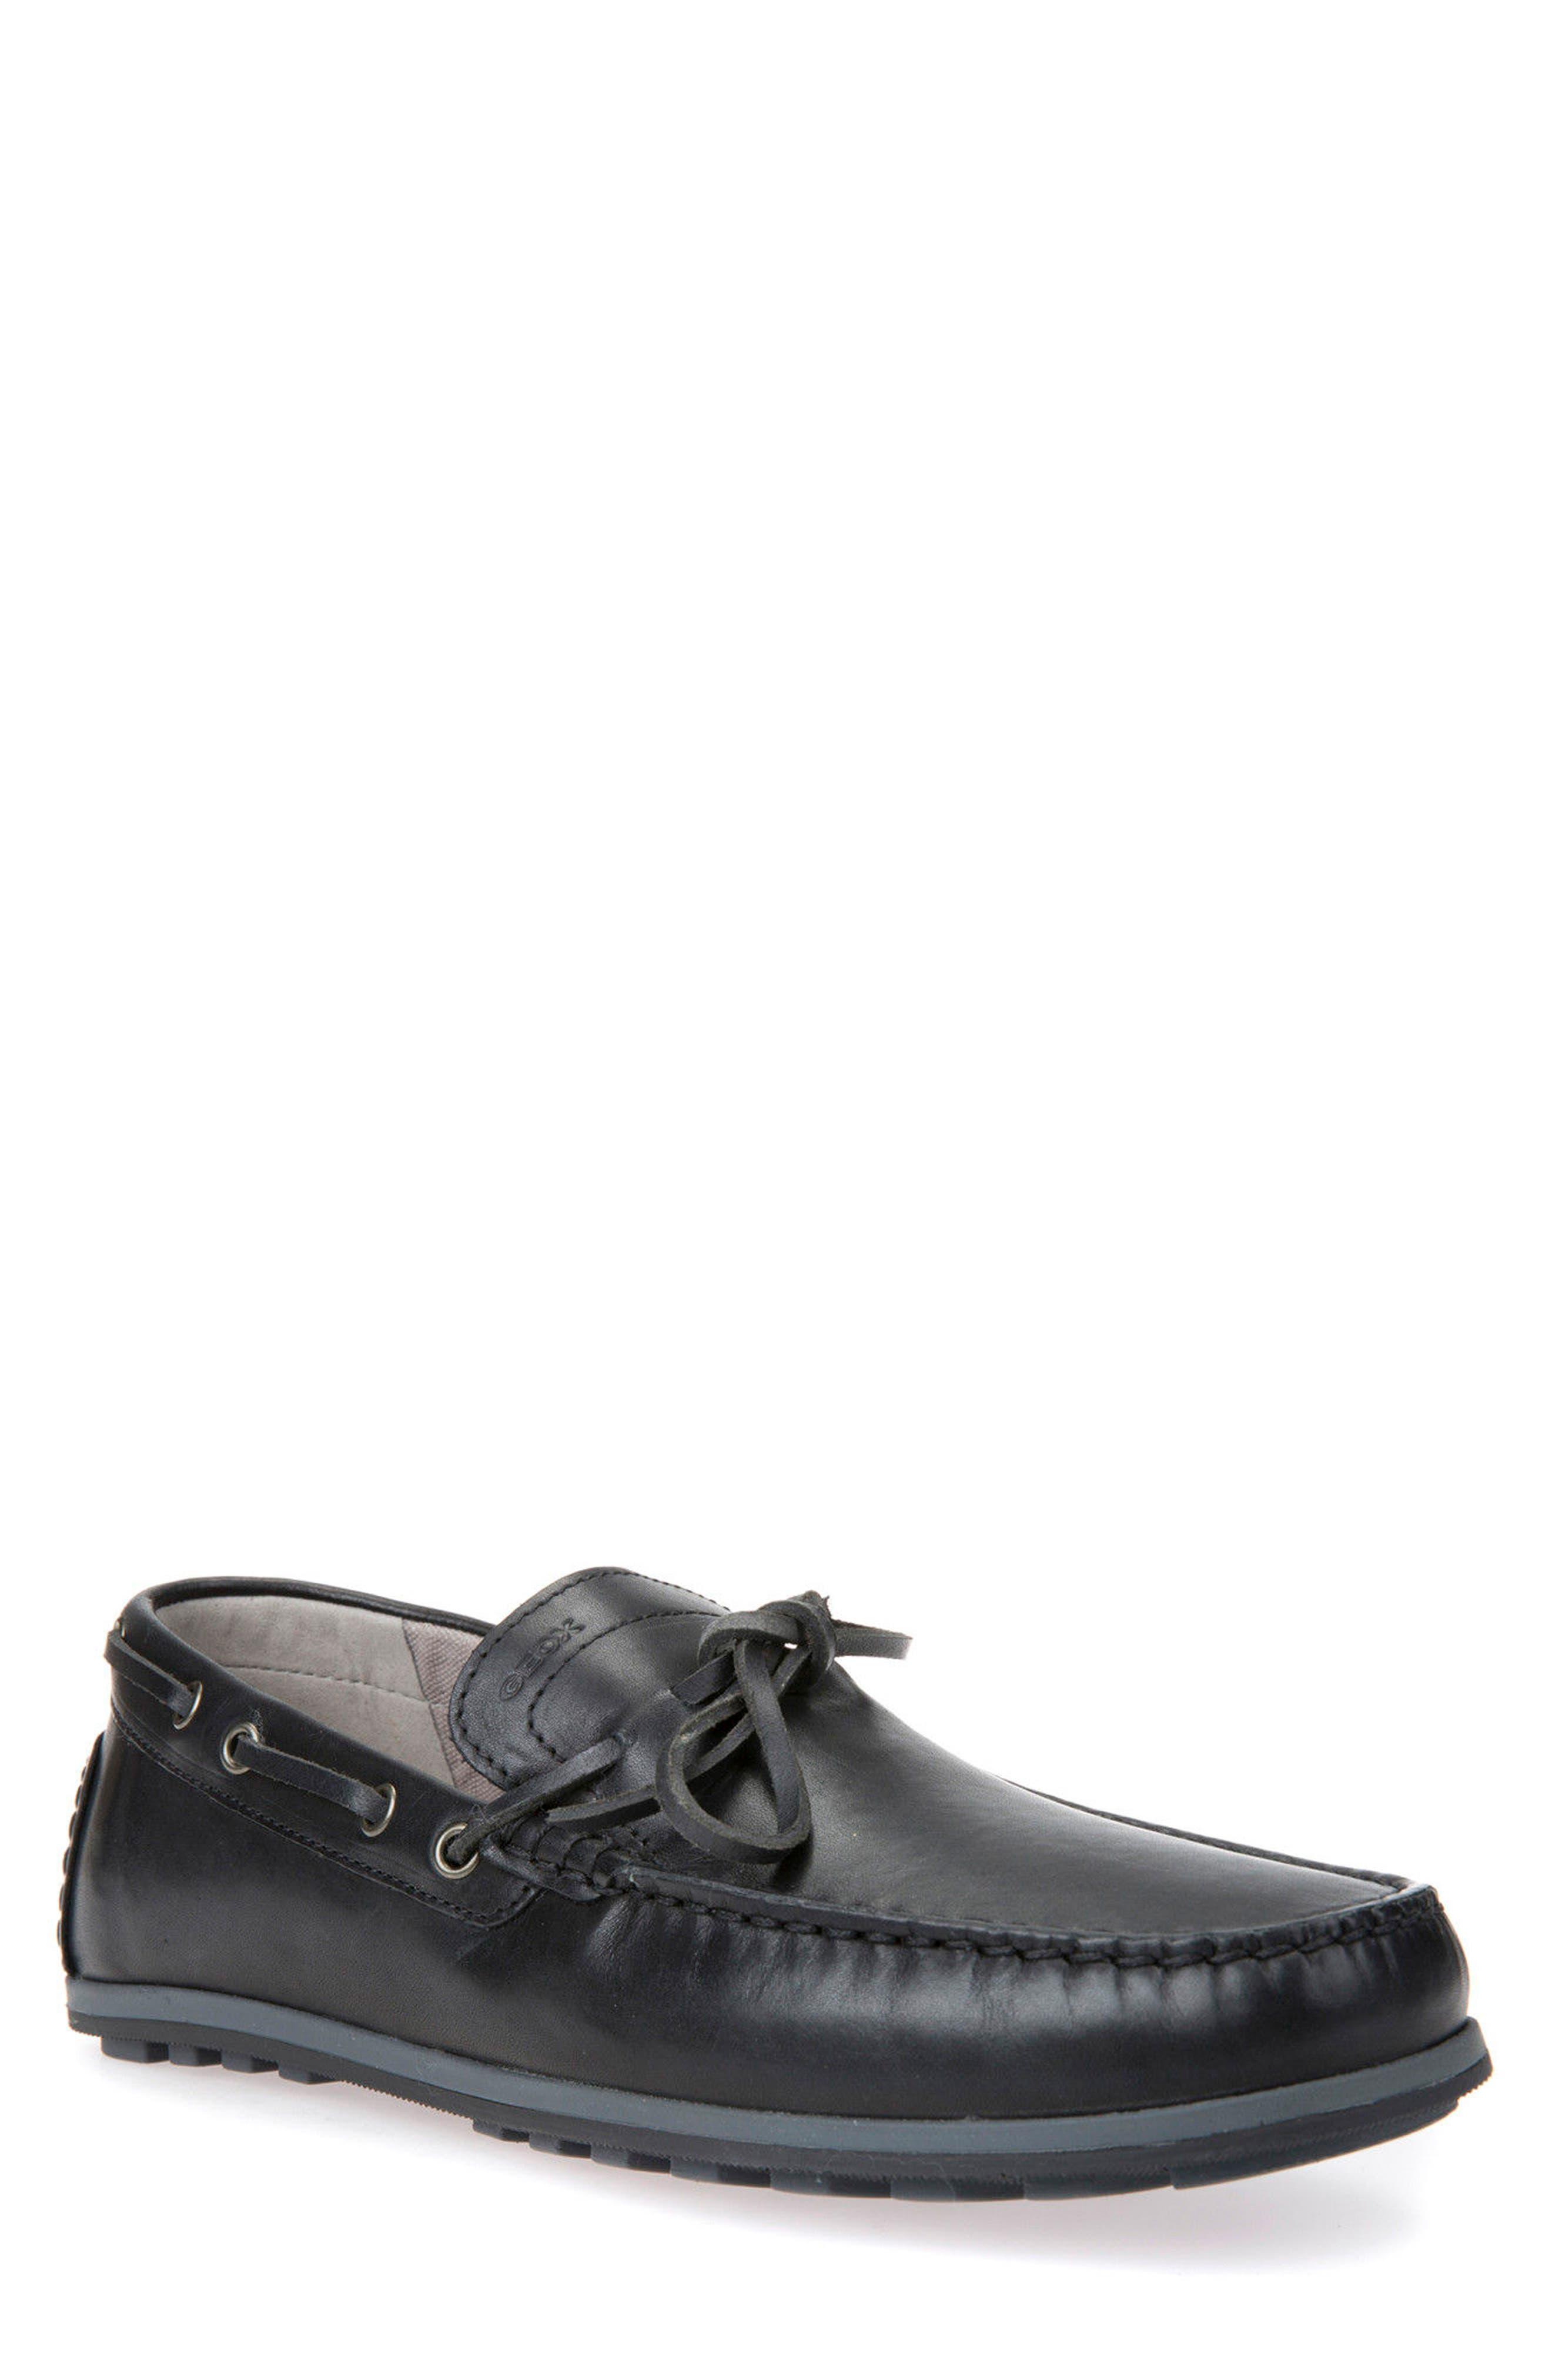 Main Image - Geox Mirvin 3 Boat Shoe (Men)